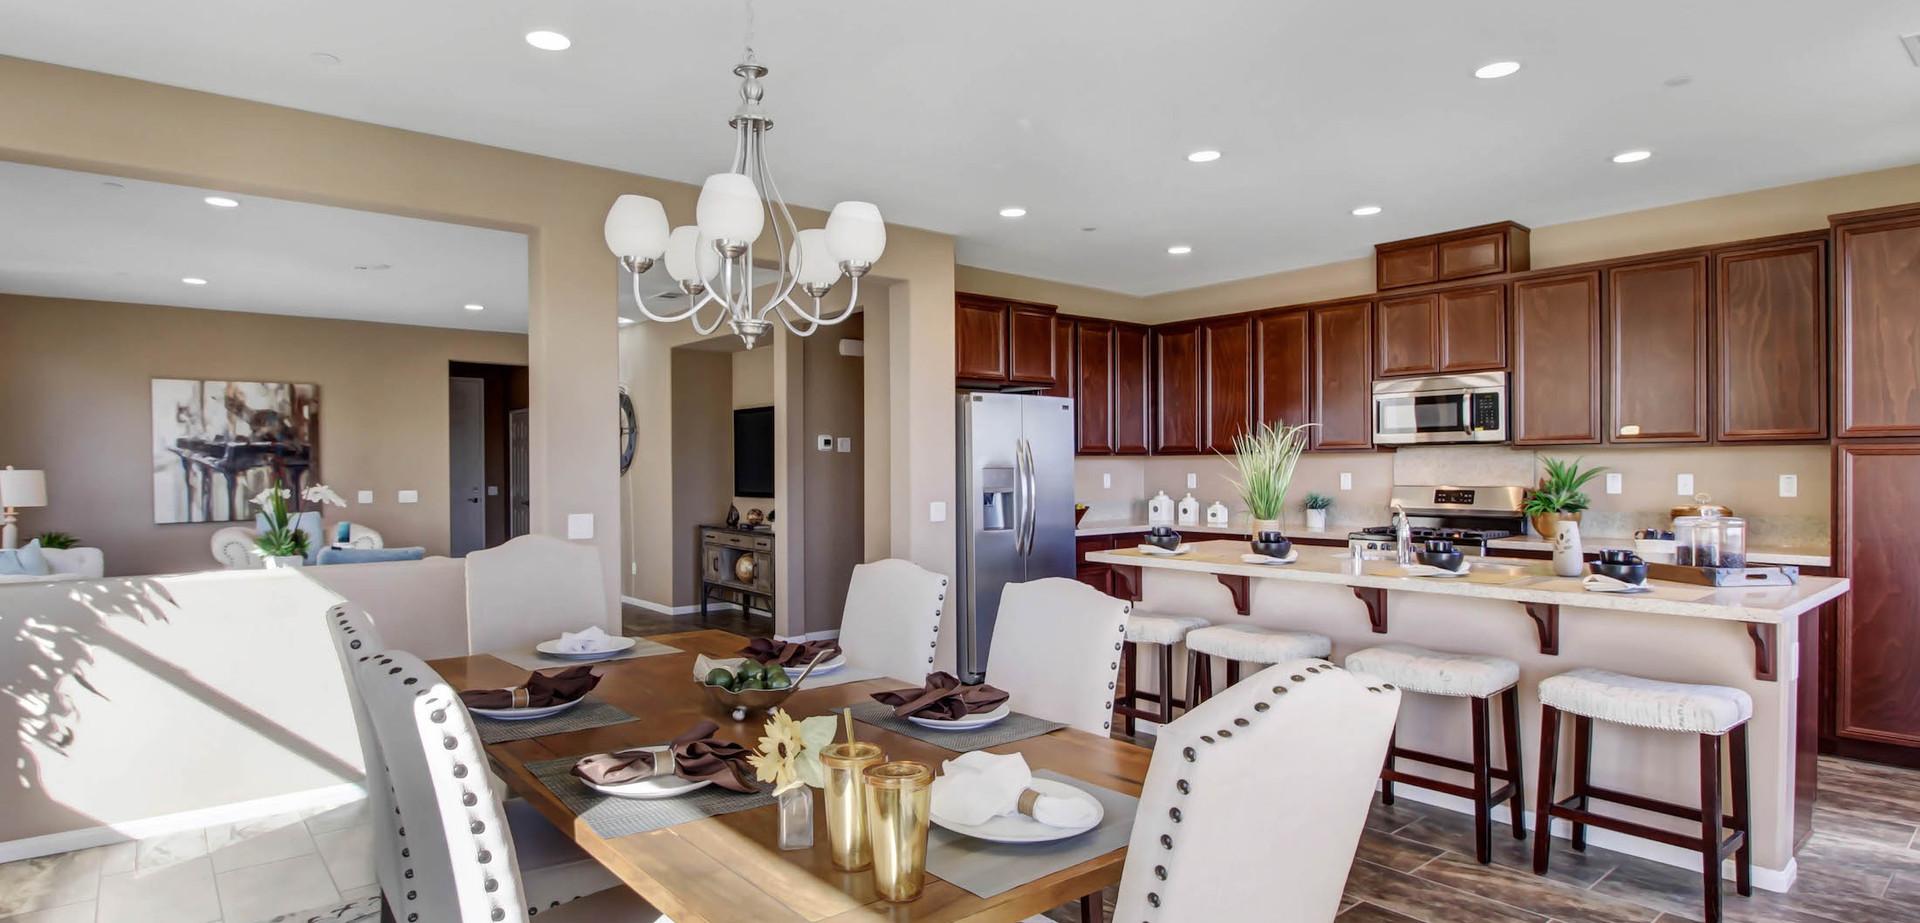 model-2 kitchen-5 2200x1500.jpg